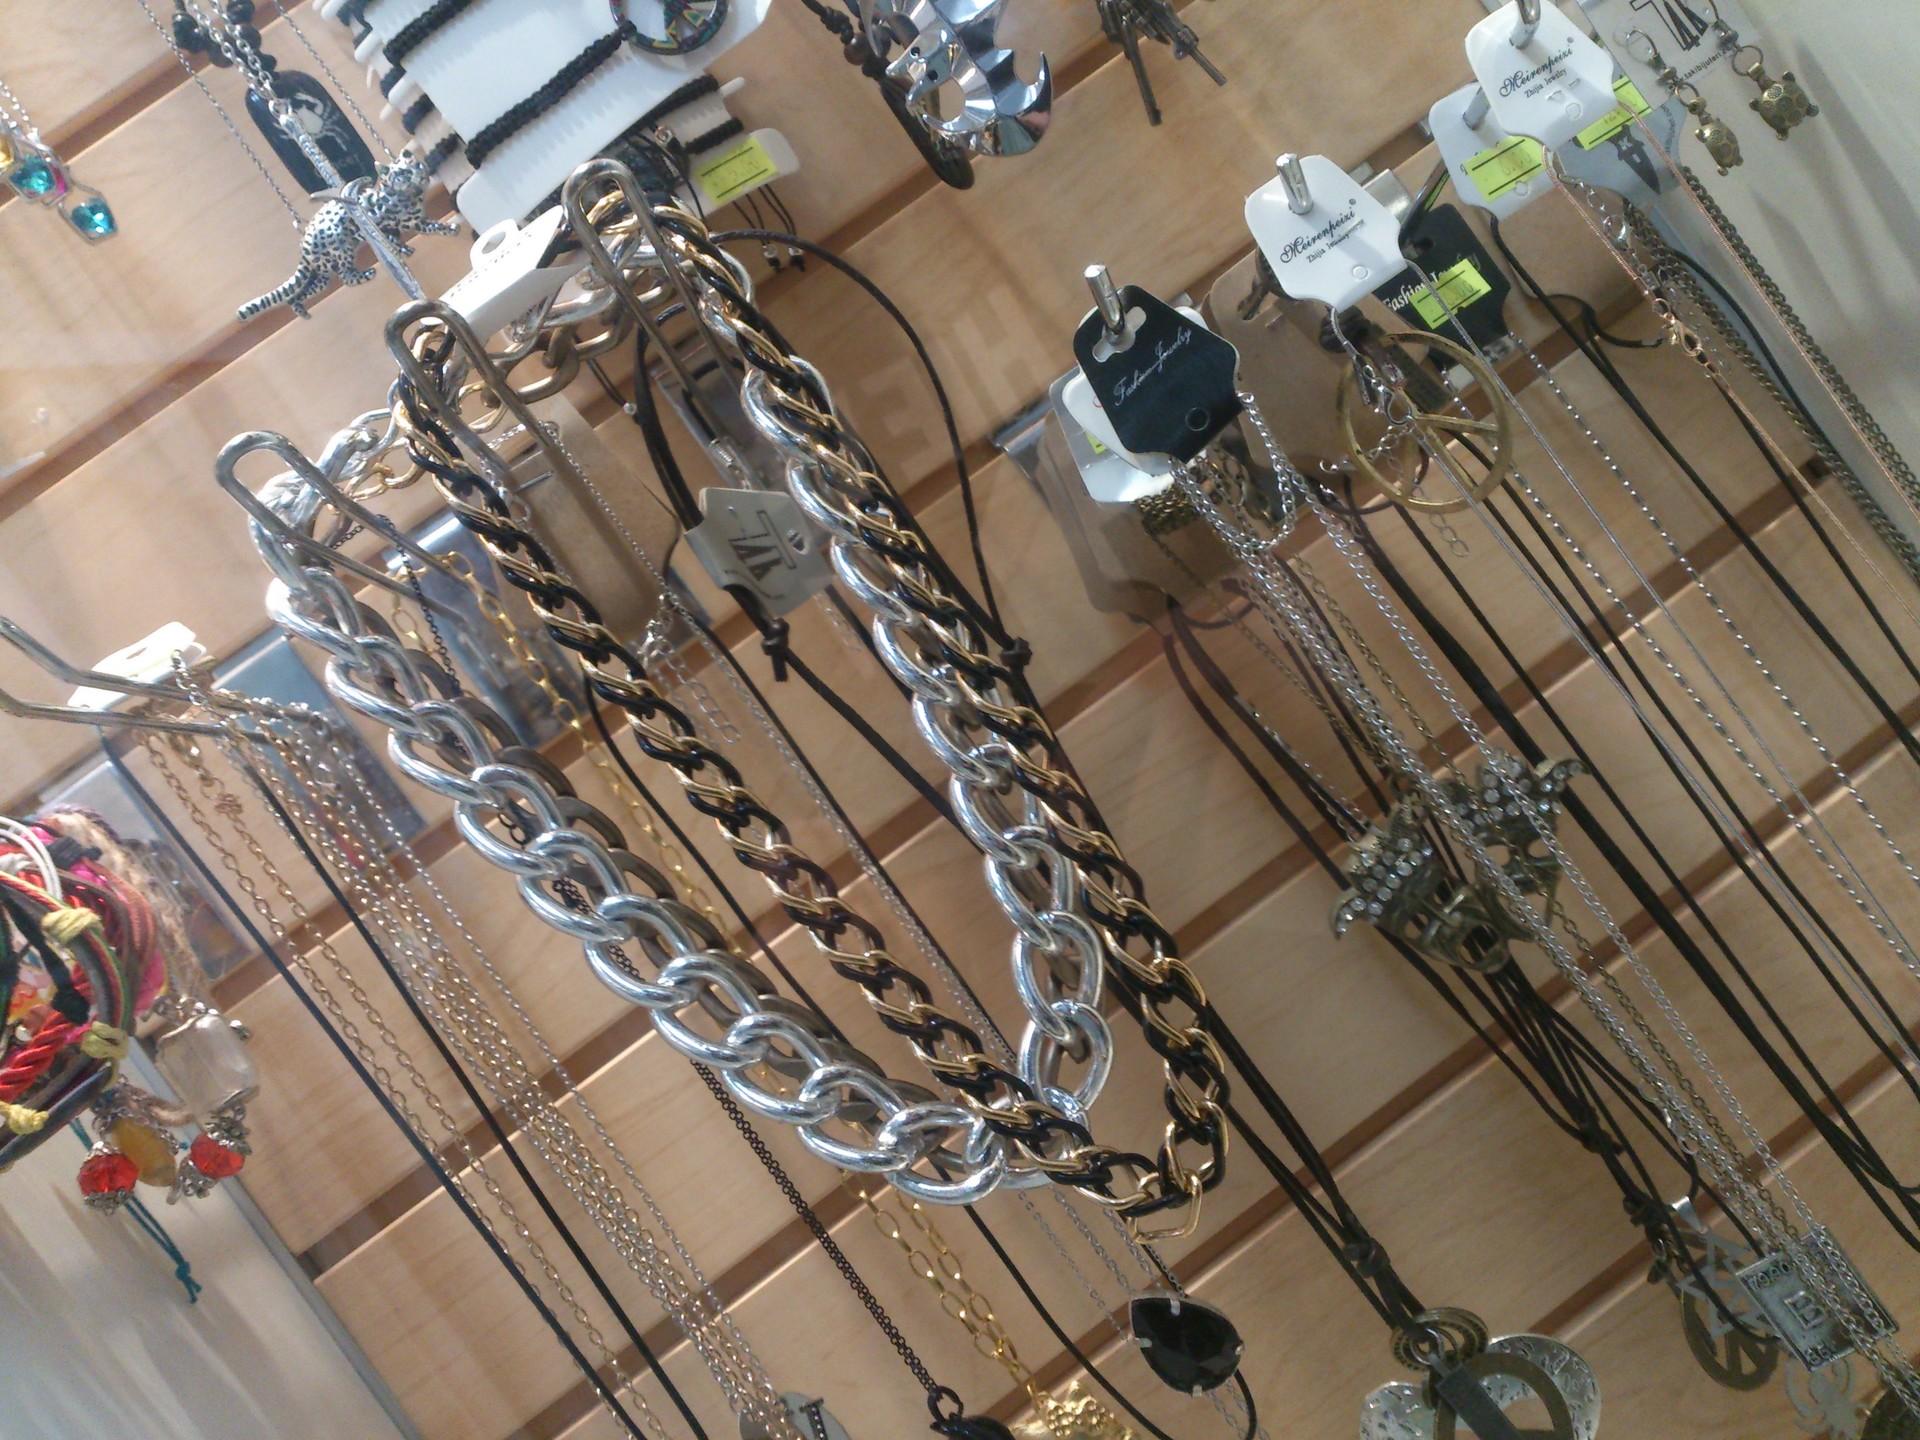 beads-knitting-db2daddae98d13c1d4af039a1